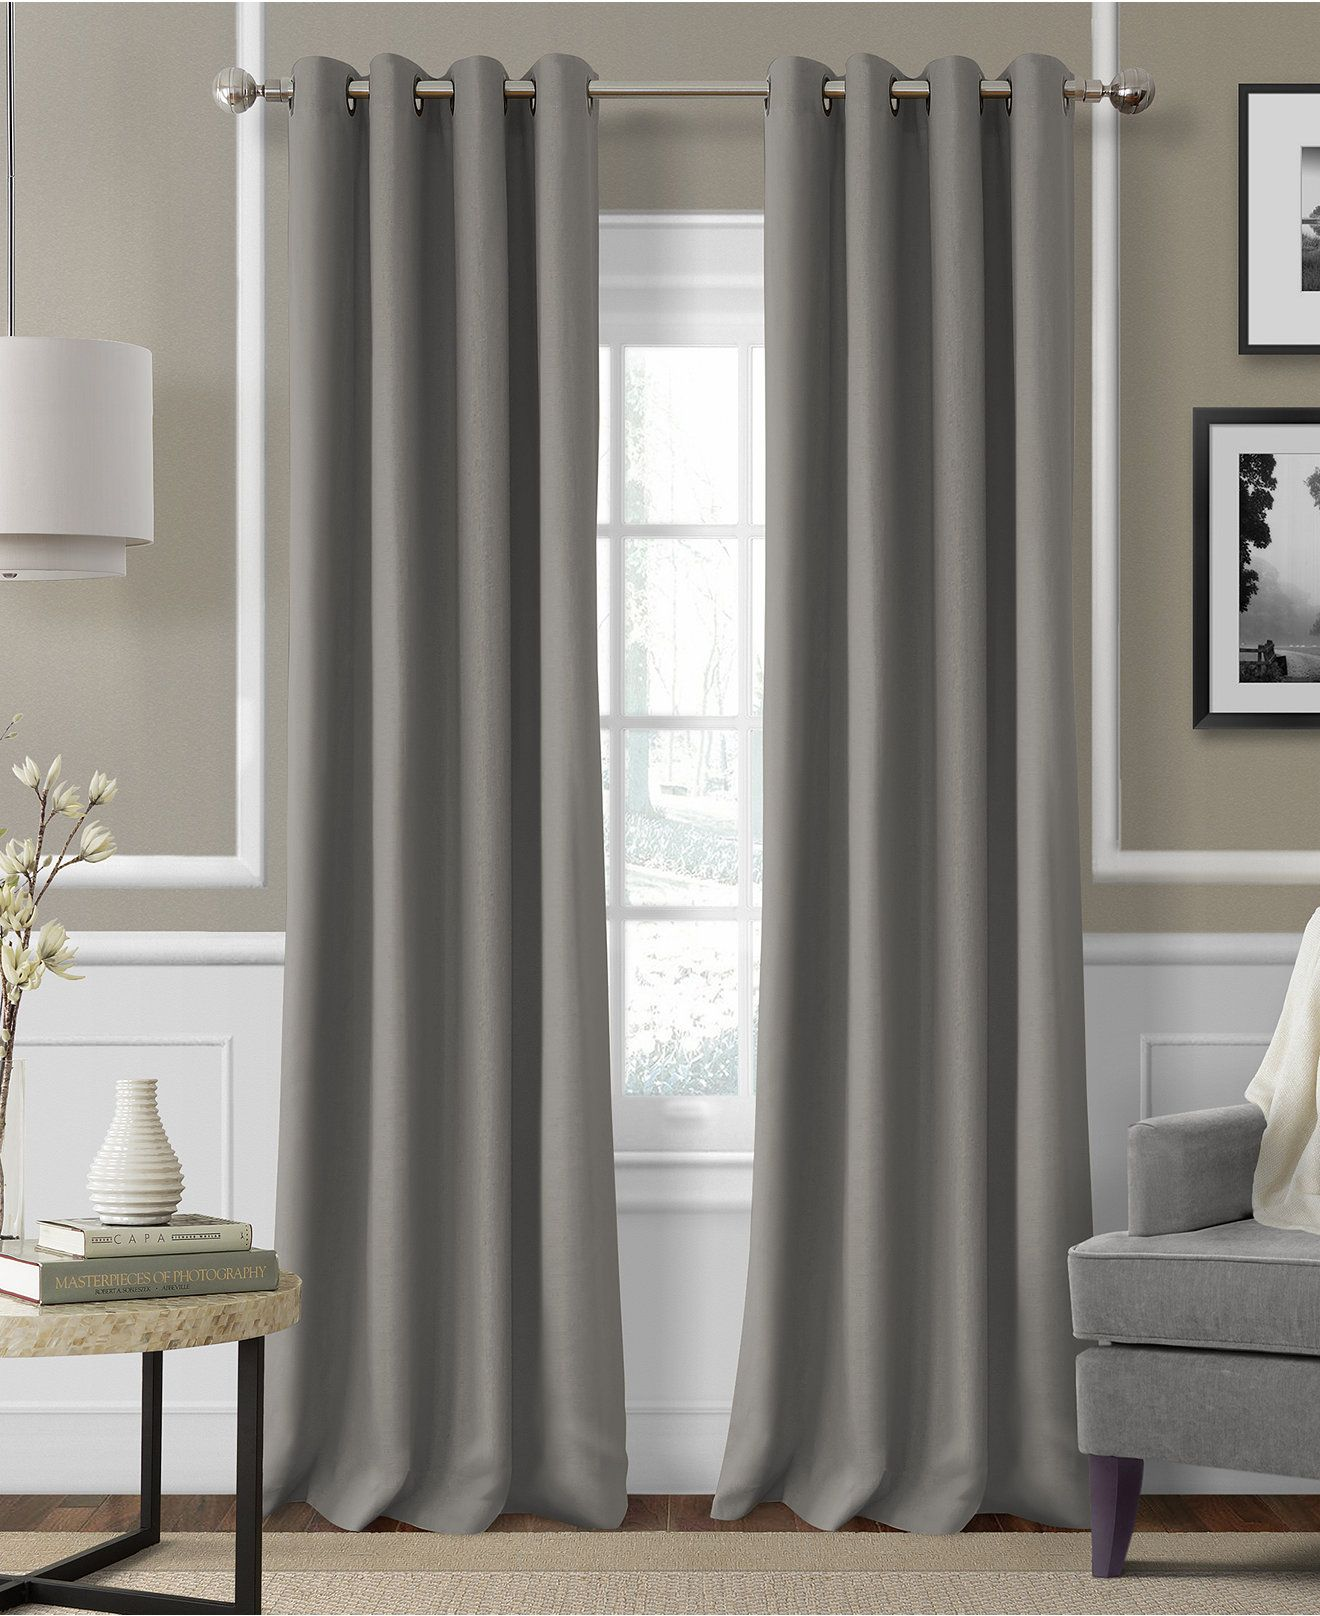 Linen window treatments - Elrene Essex Grommet Linen 50 X 95 Panel Window Panelscurtain